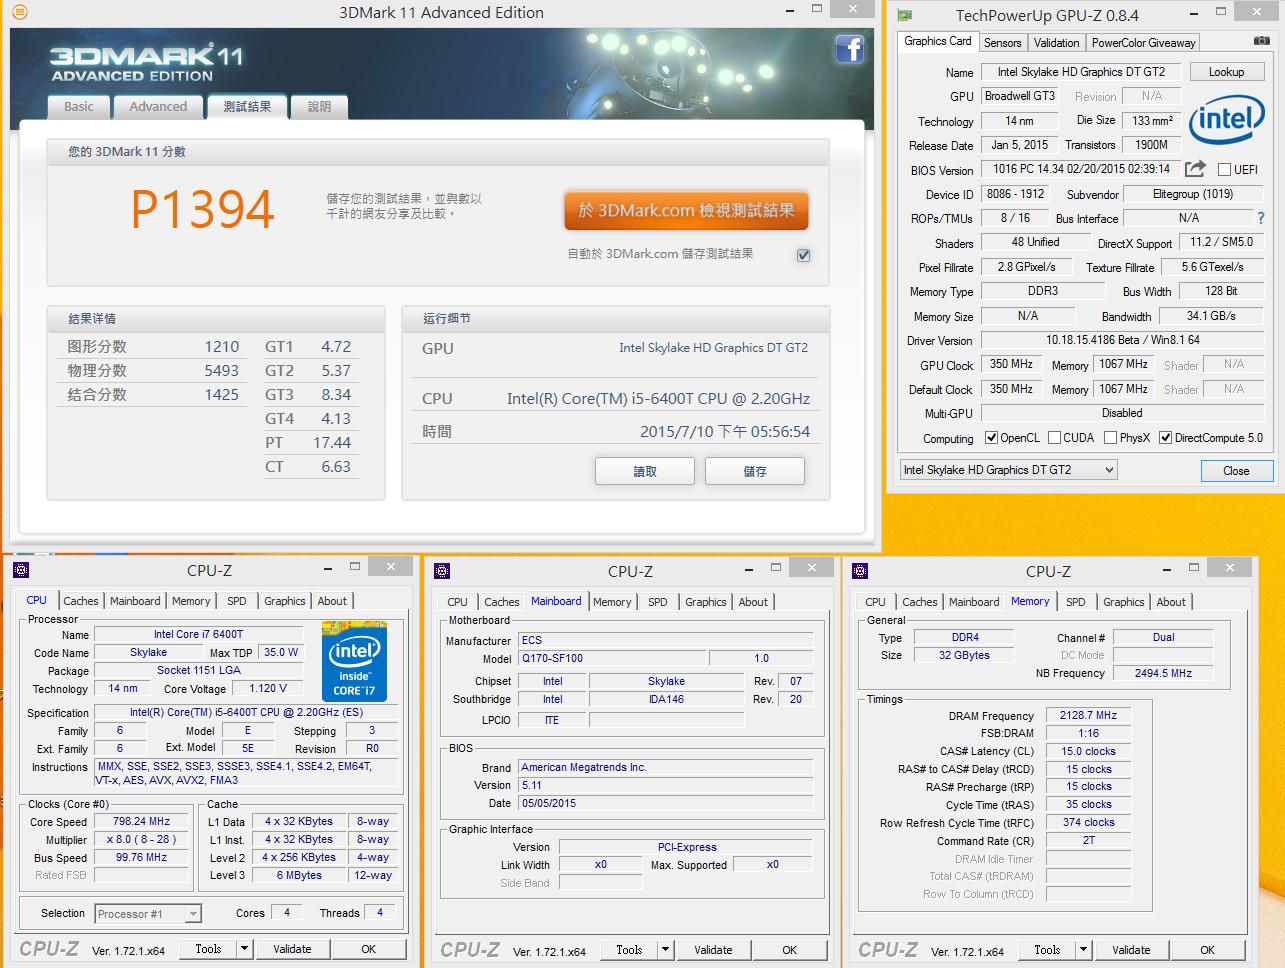 skylake-core-i5-6400t_3dmark-11-performance